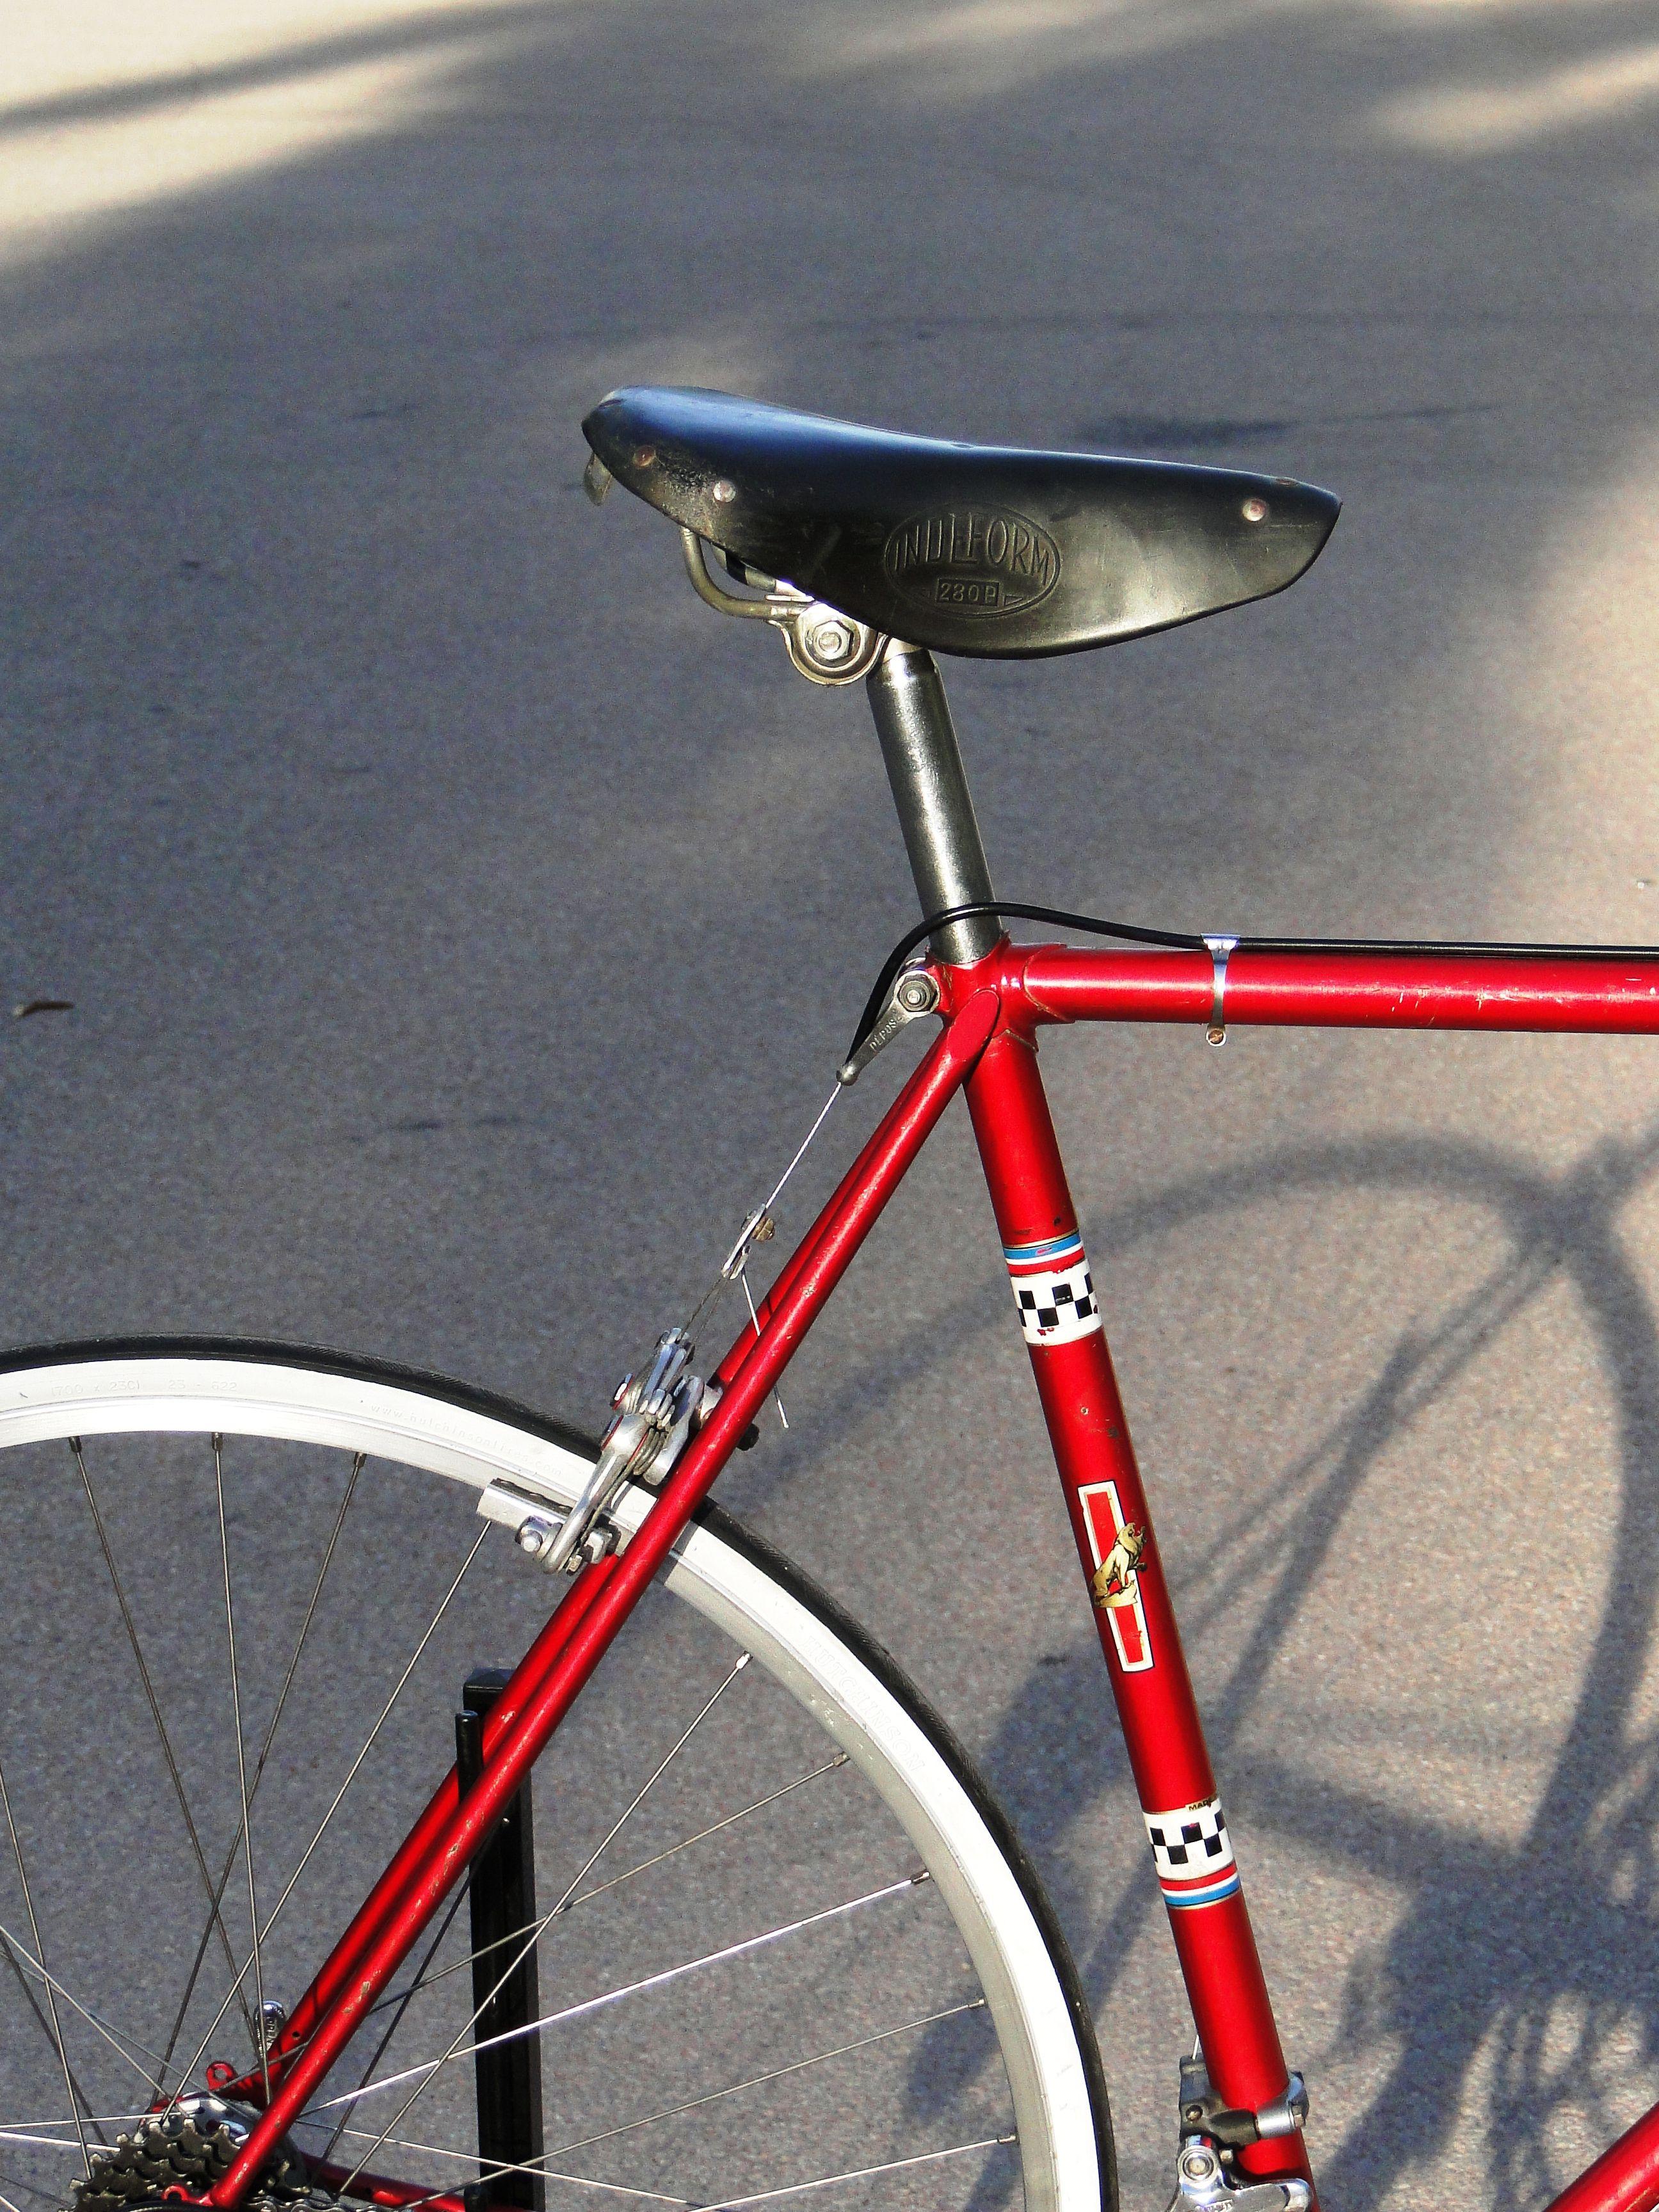 Pin By Monsieur Velo On Bicycles I Restored Peugeot Bike Road Bike Vintage Bike Design